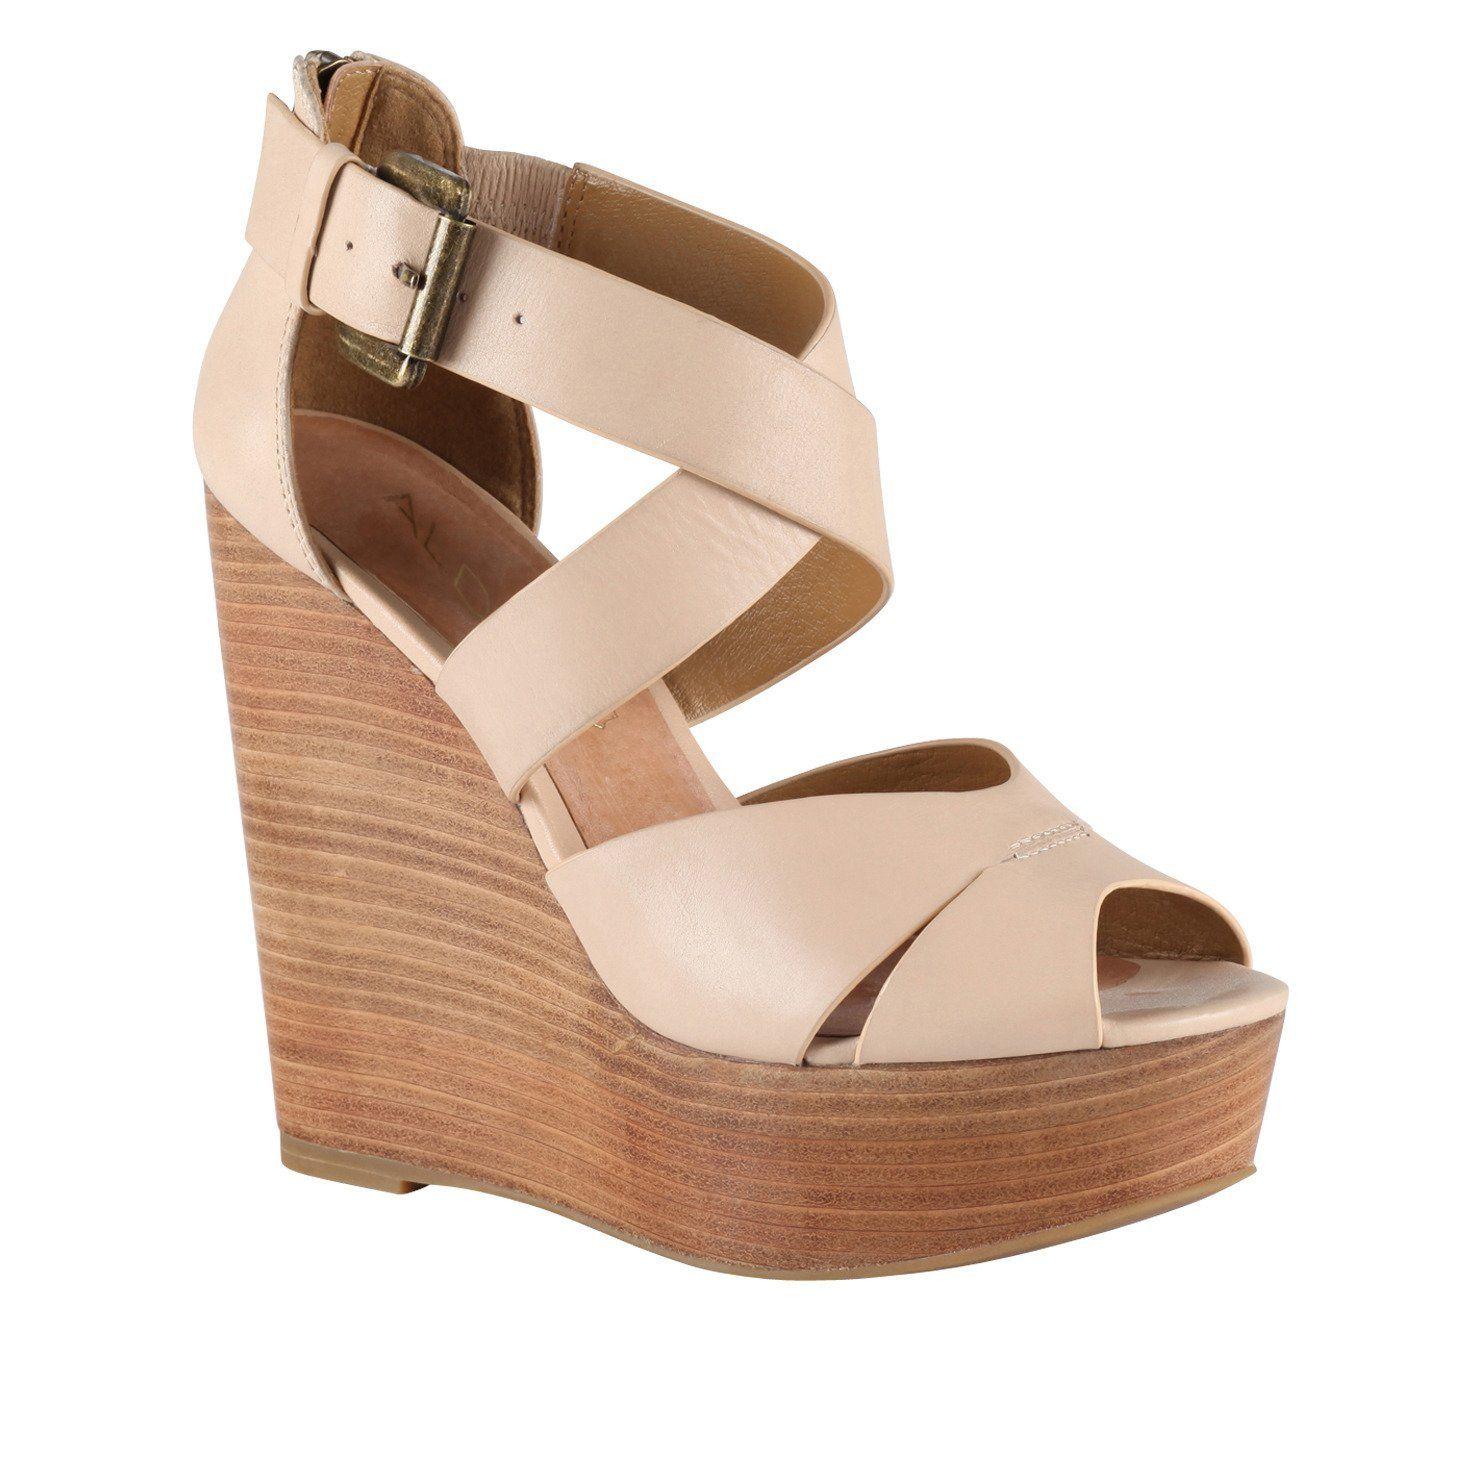 2077f8535d653 Amazon.com: ALDO Tumoa - Women Wedge Sandals: Shoes | Wonderful ...